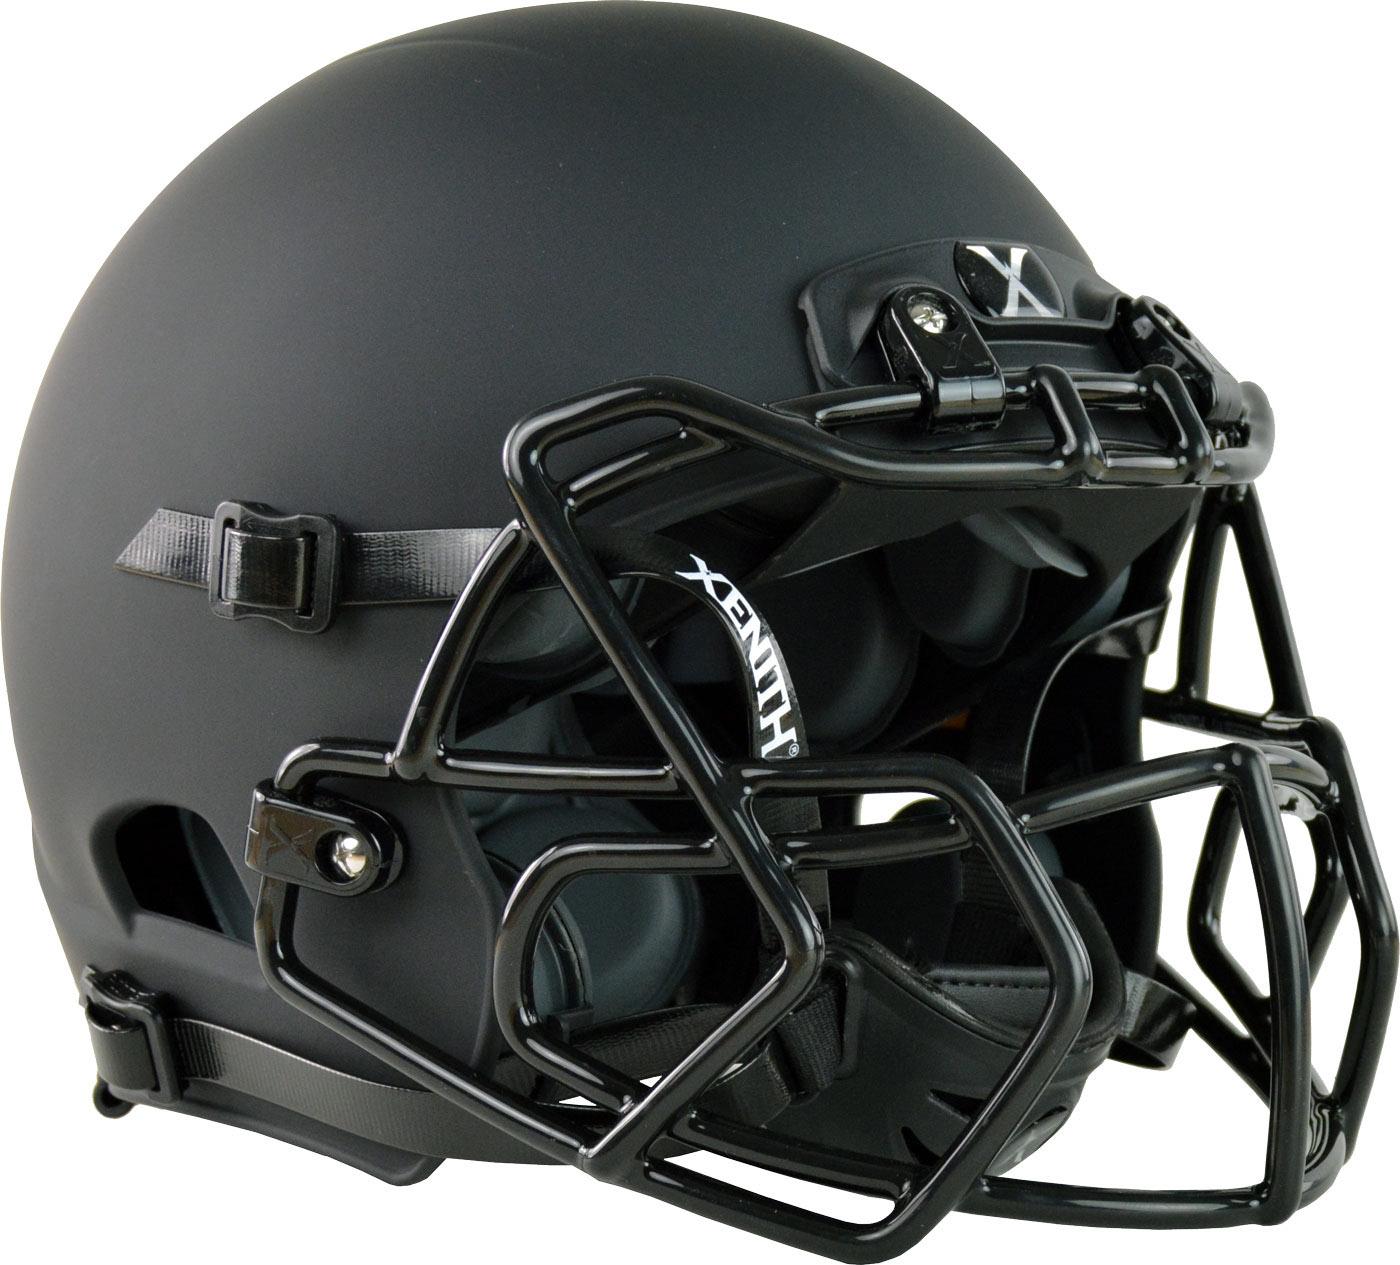 Xenith helmet